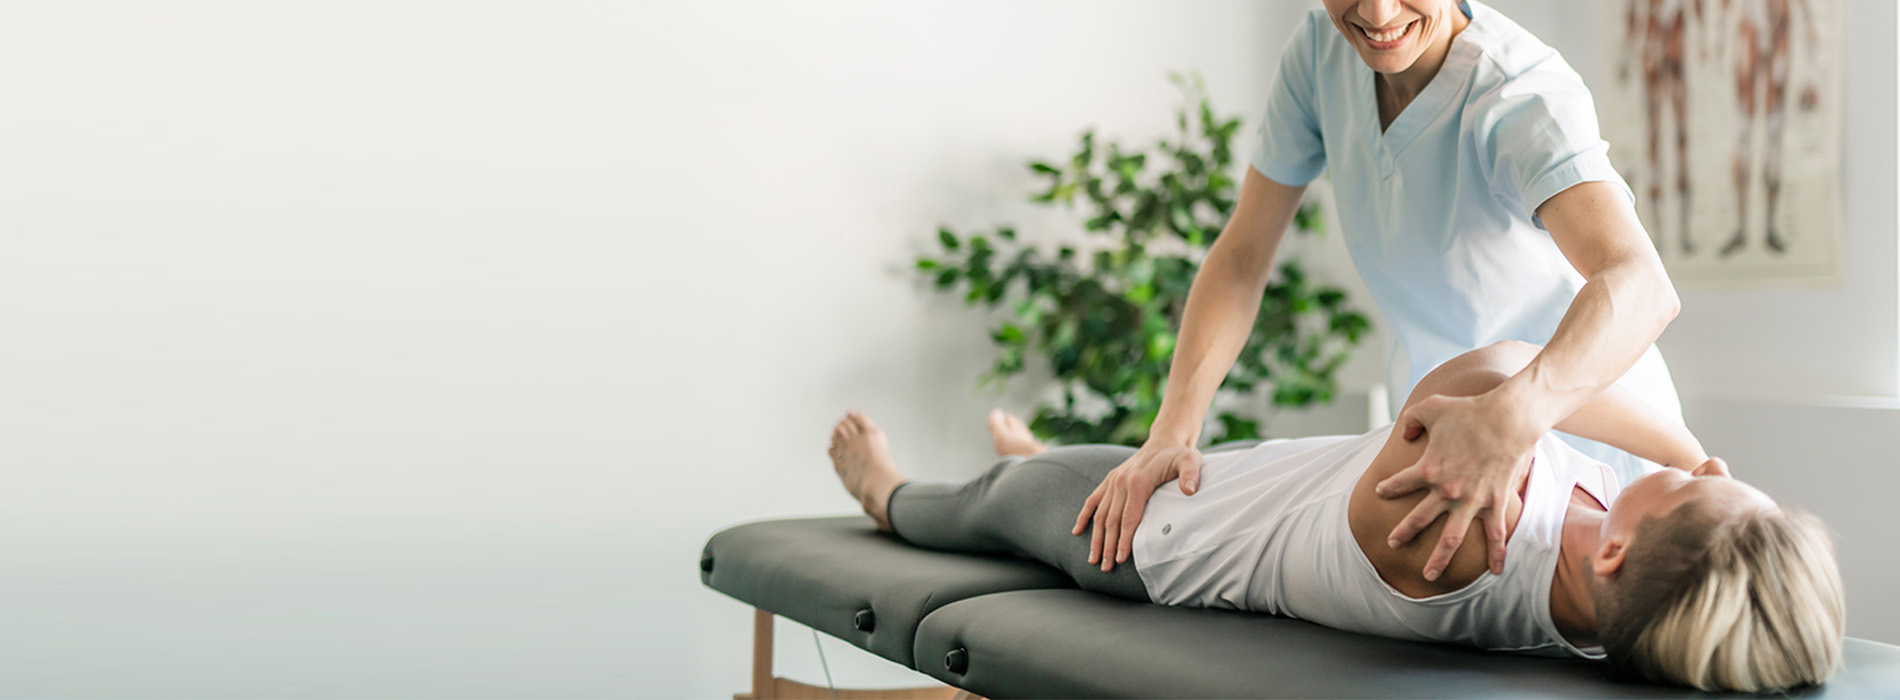 Behandeling fysiotherapeut